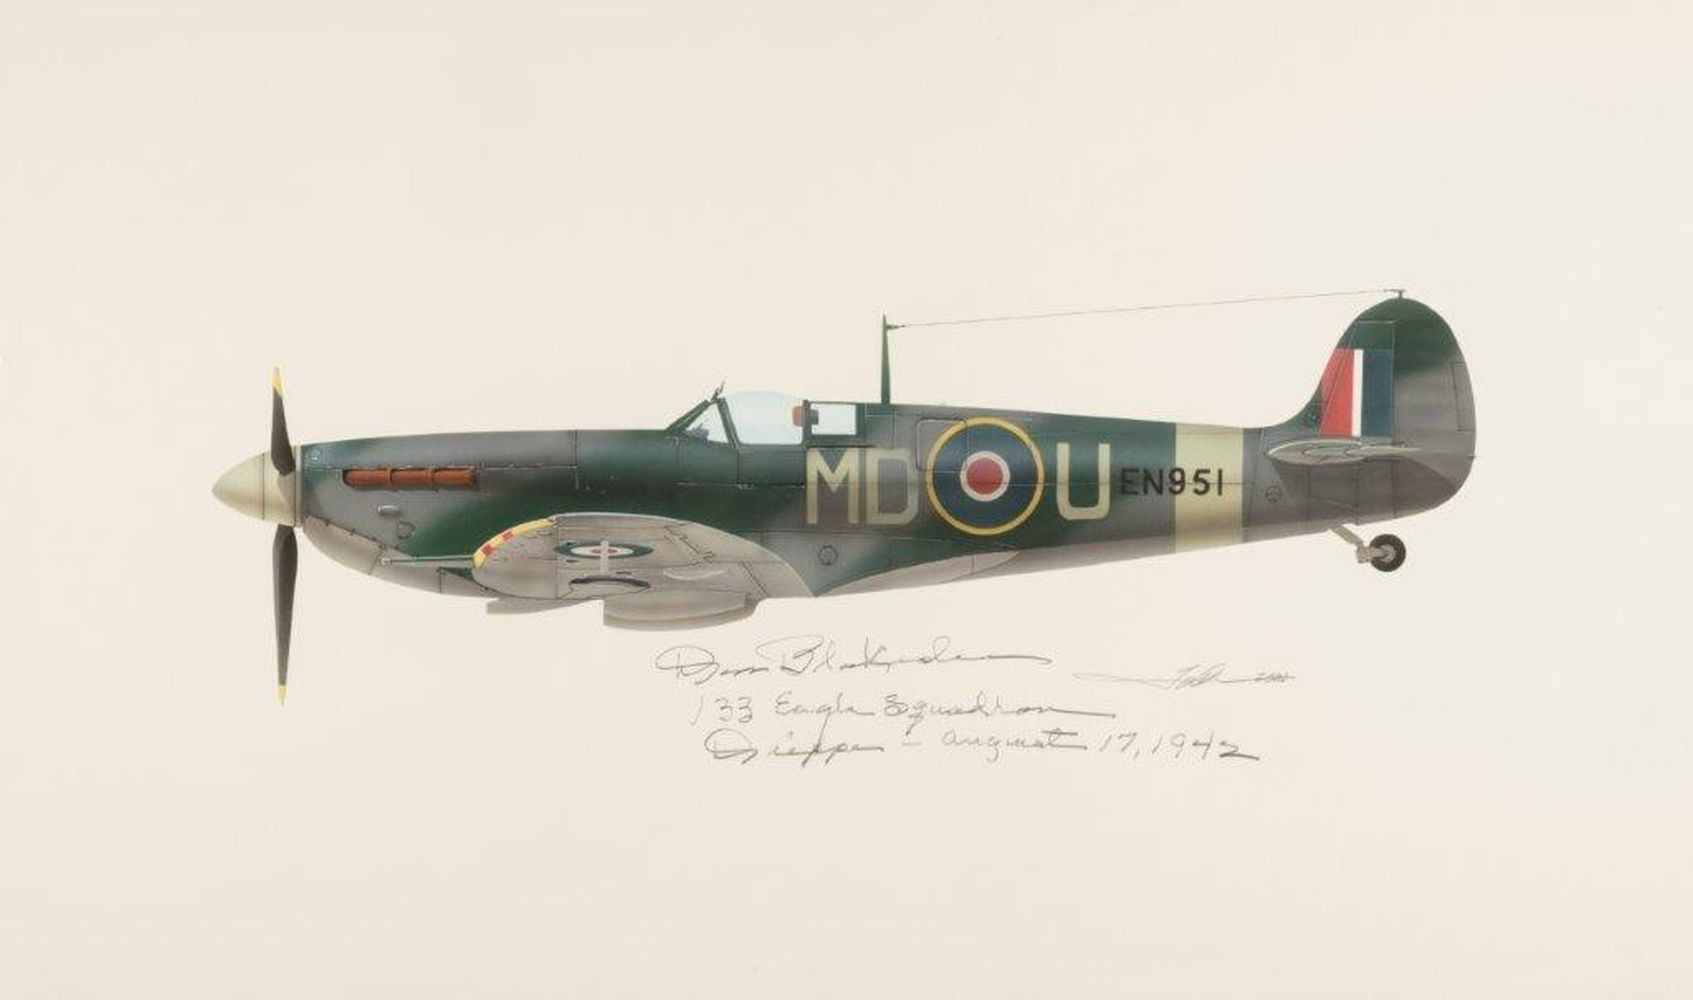 "* Valo (John C., circa 1963), Supermarine Spitfire Mk.Vb EN951 – 133 ""Eagle"" Squadron"